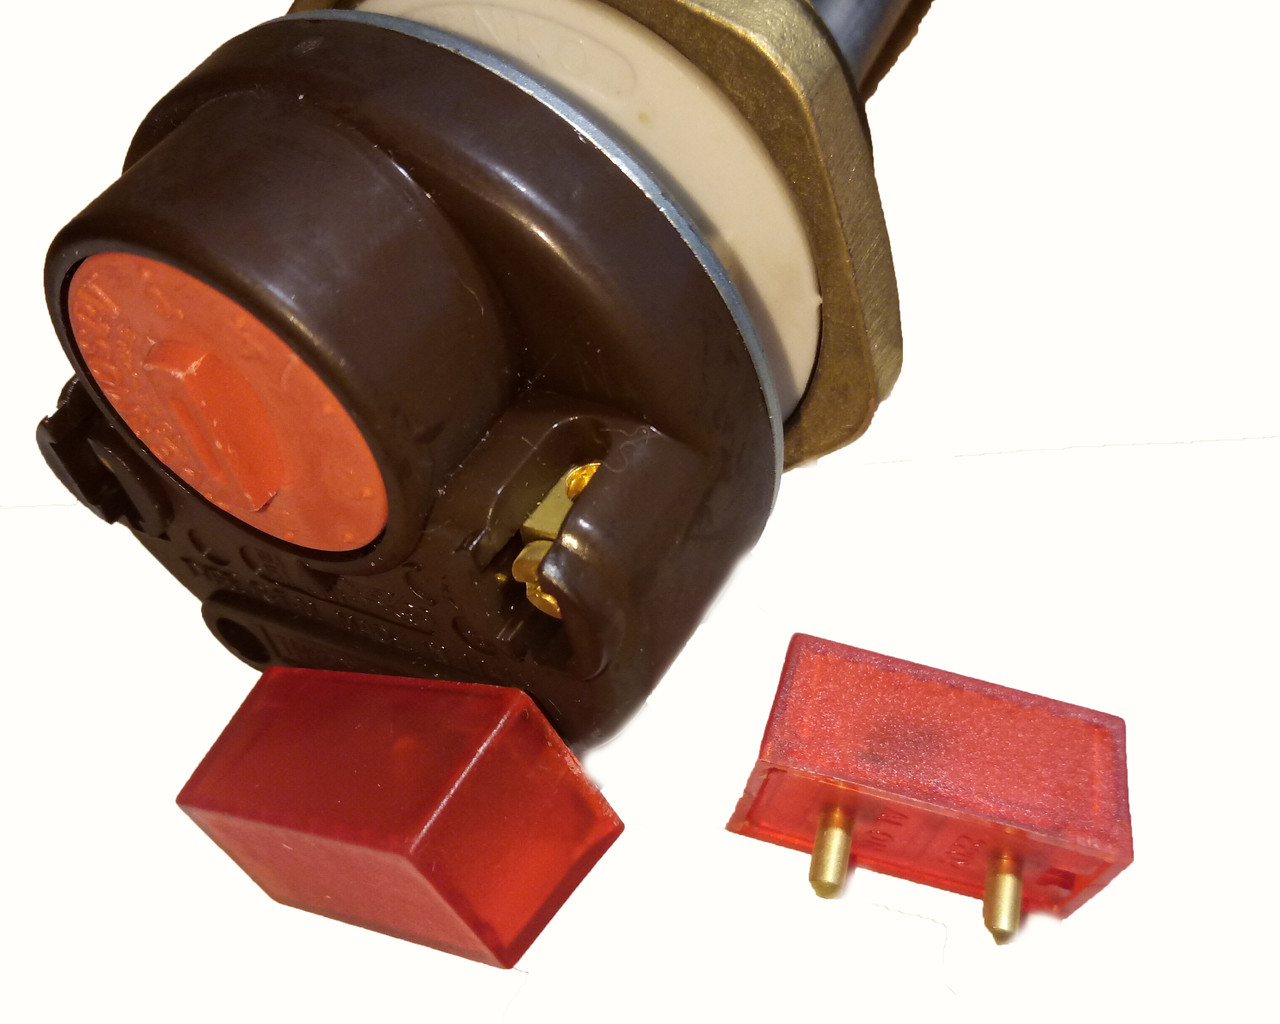 Светодиод для штырьевого терморегулятора (бойлера или батарейного тэна)